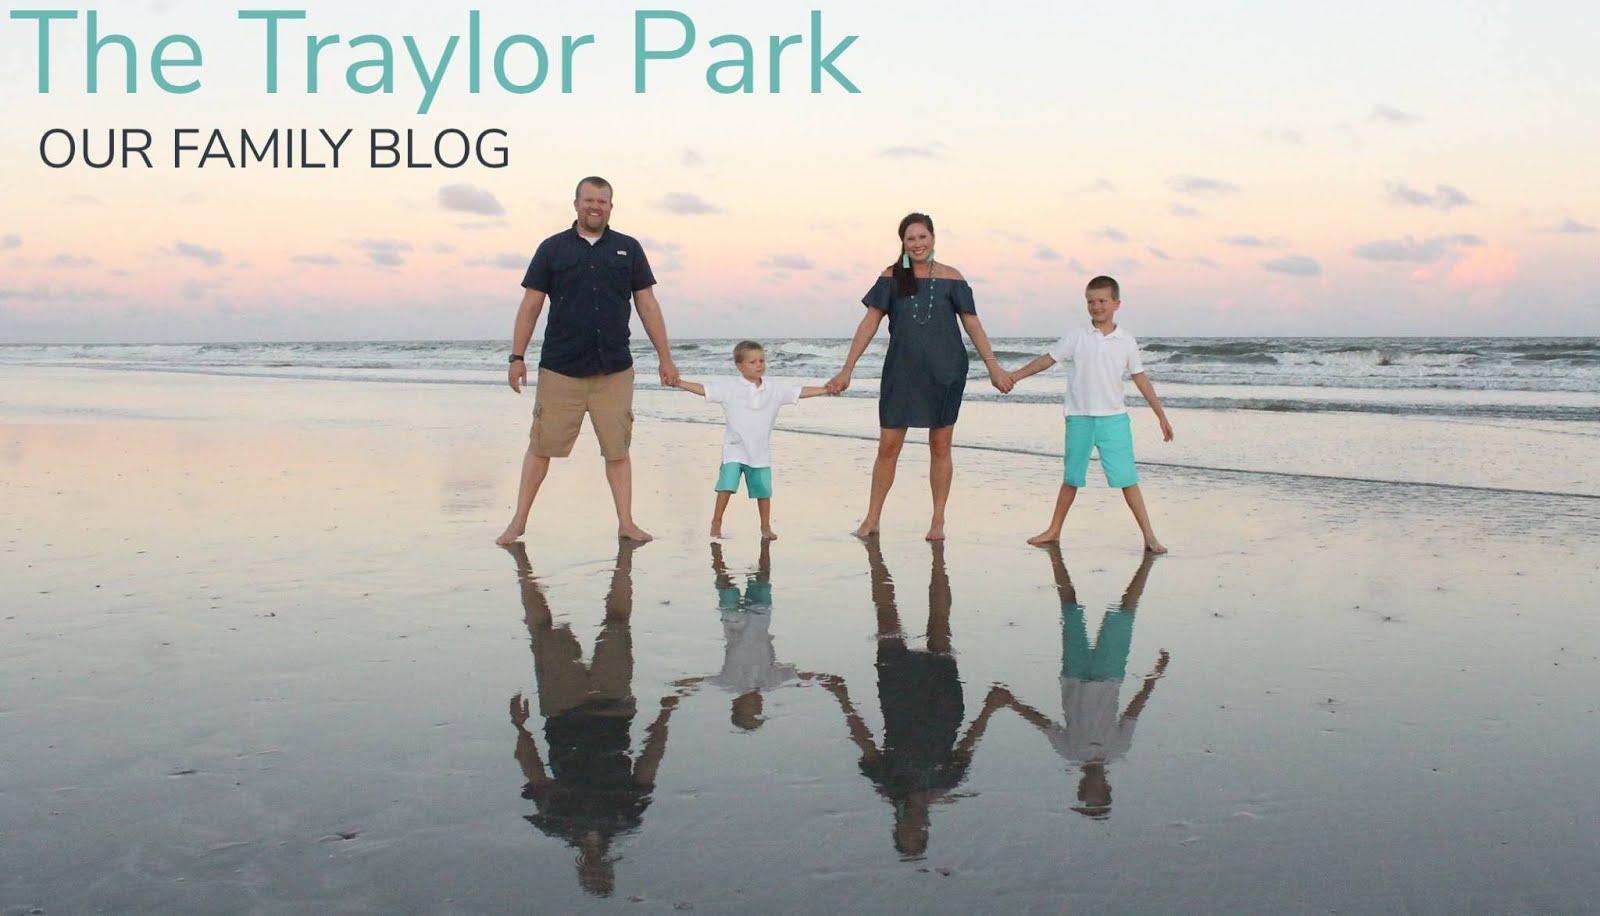 The Traylor Park